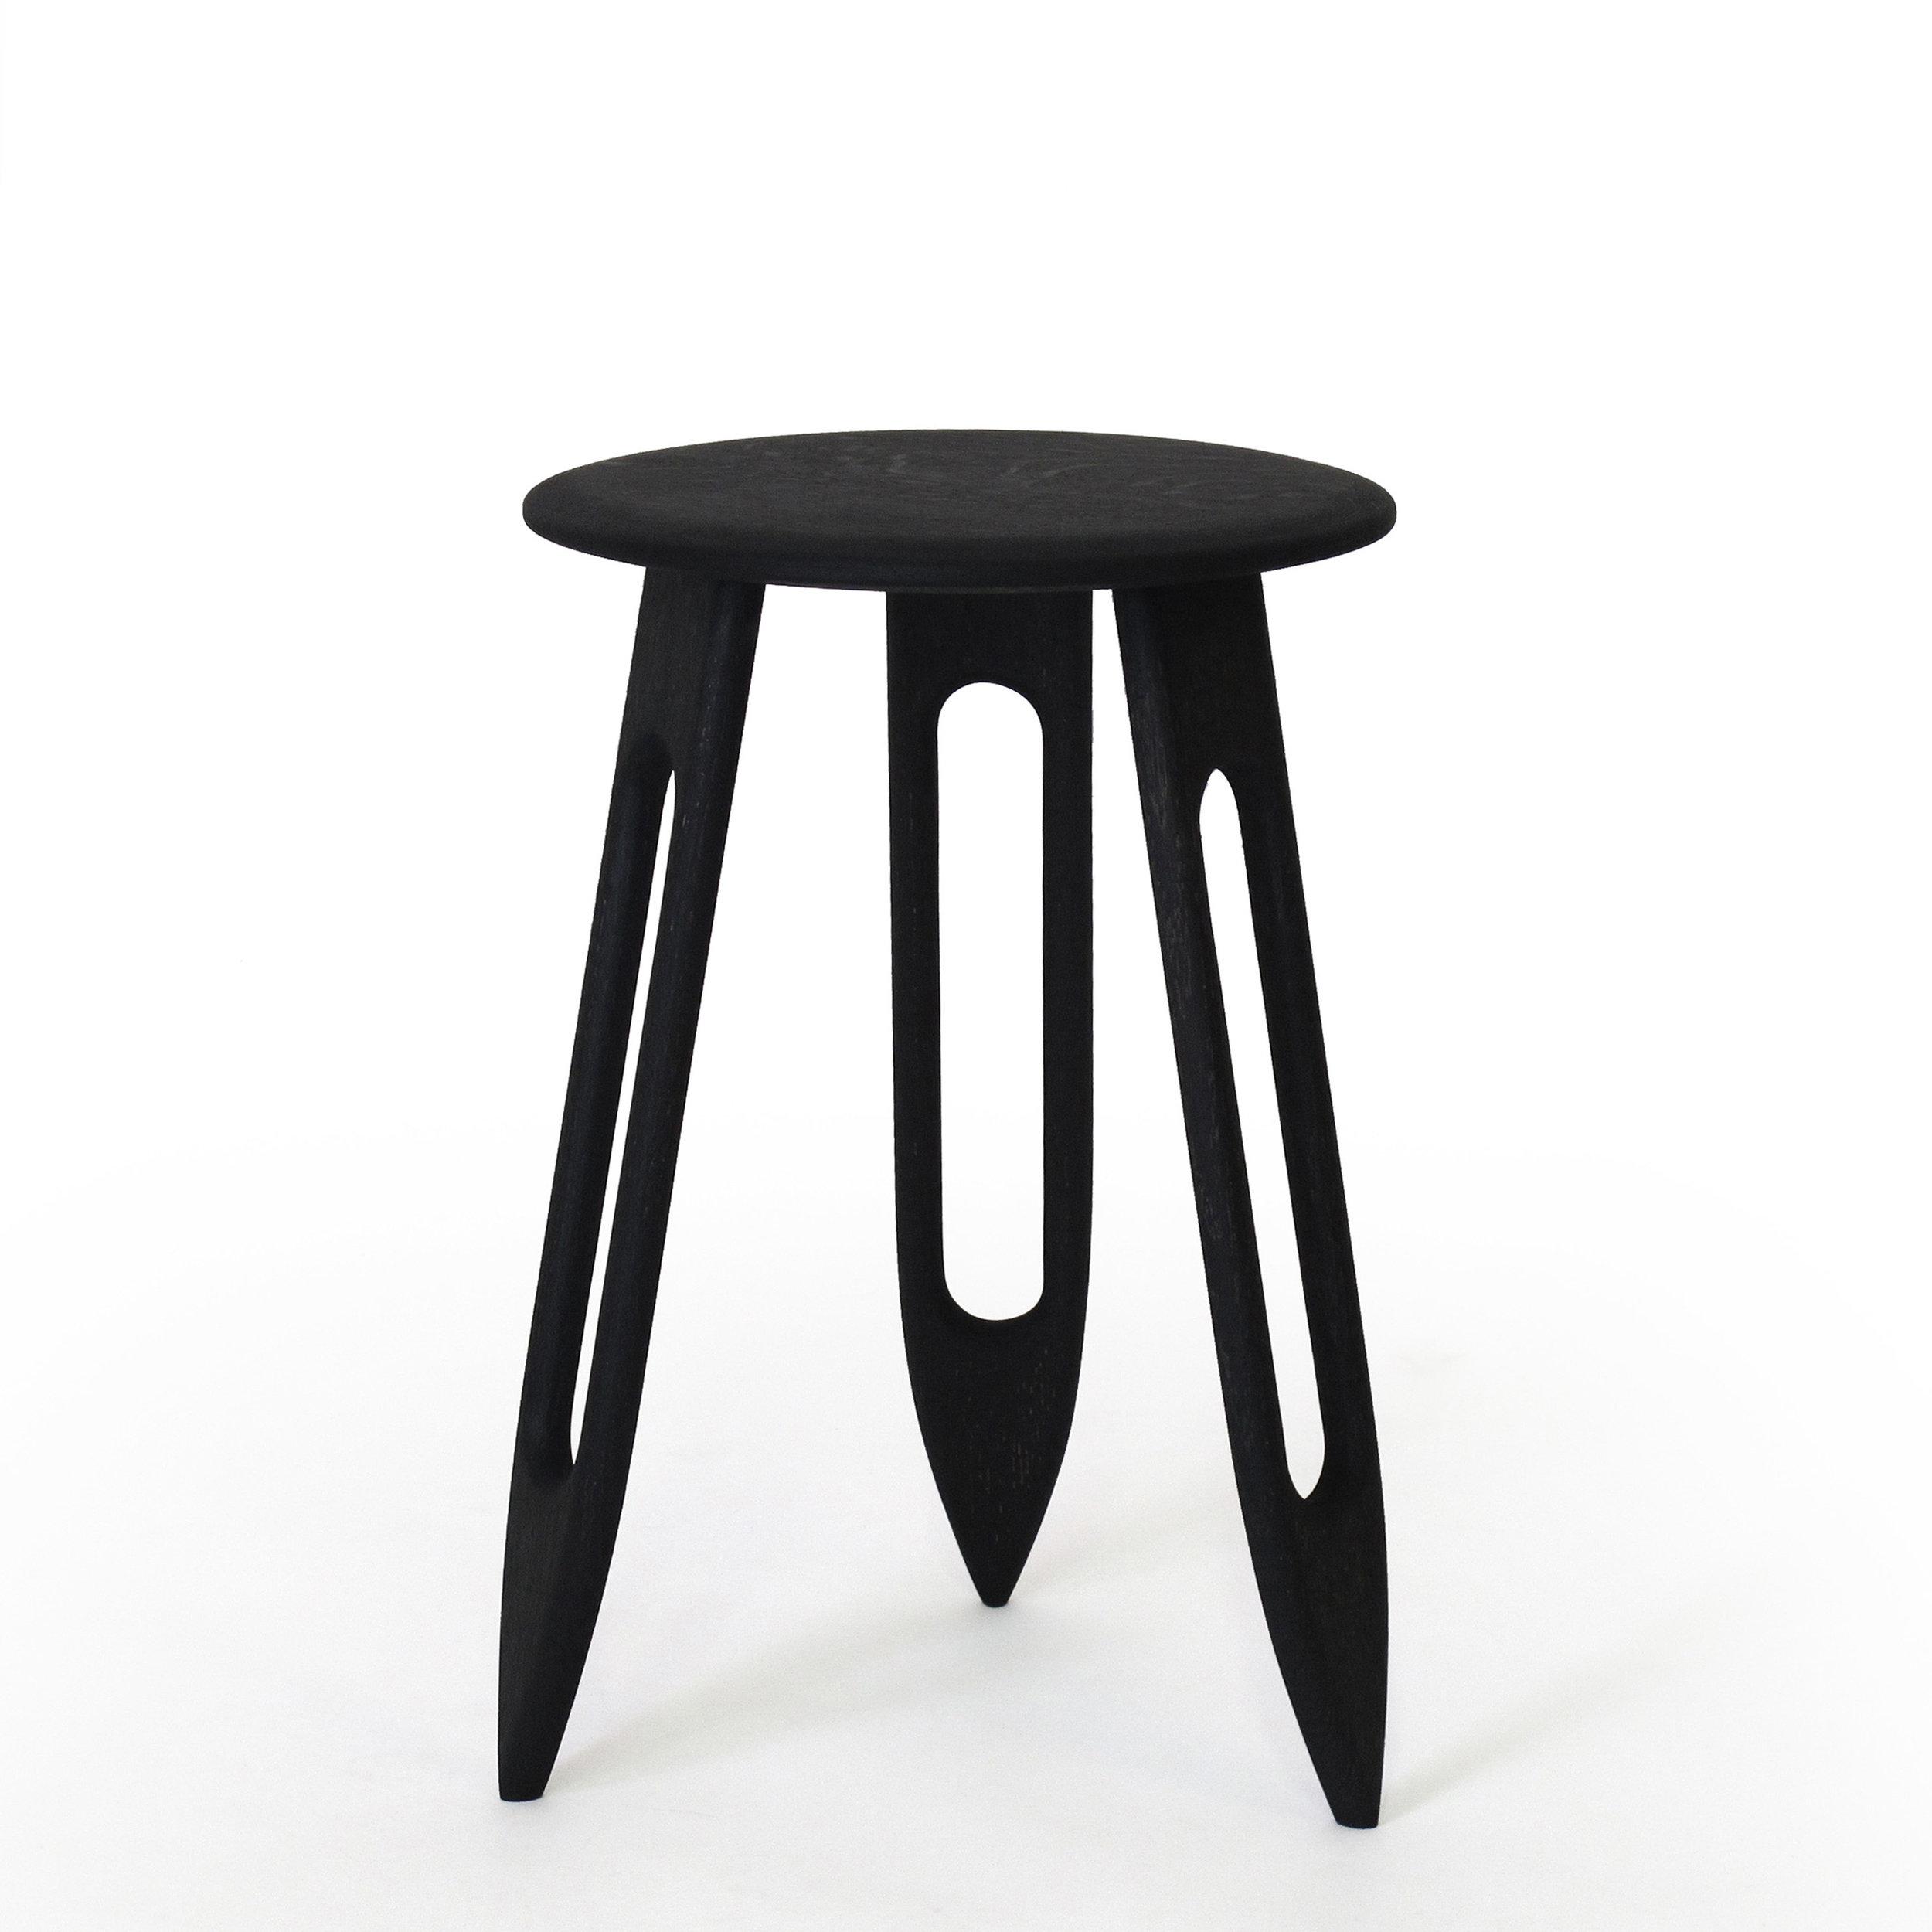 "TIBULA 18"" SIDE TABLE"